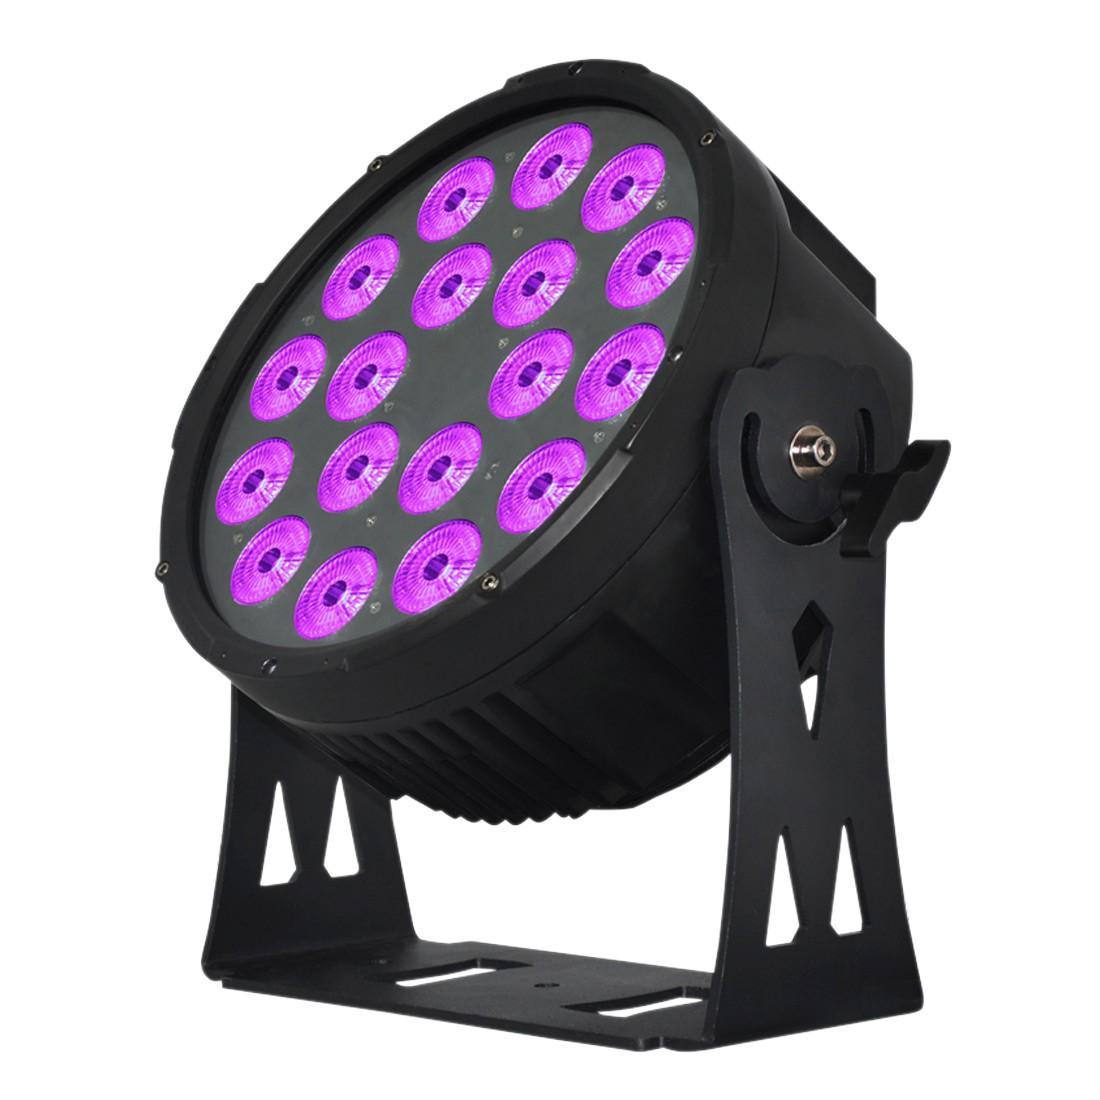 Elation SIXPAR 300IP 18 x 12-Watt 6-In-1 RGBAW Plus UV LEDs Dual Yoke/Floor Stand Par Fixture (SIX025)